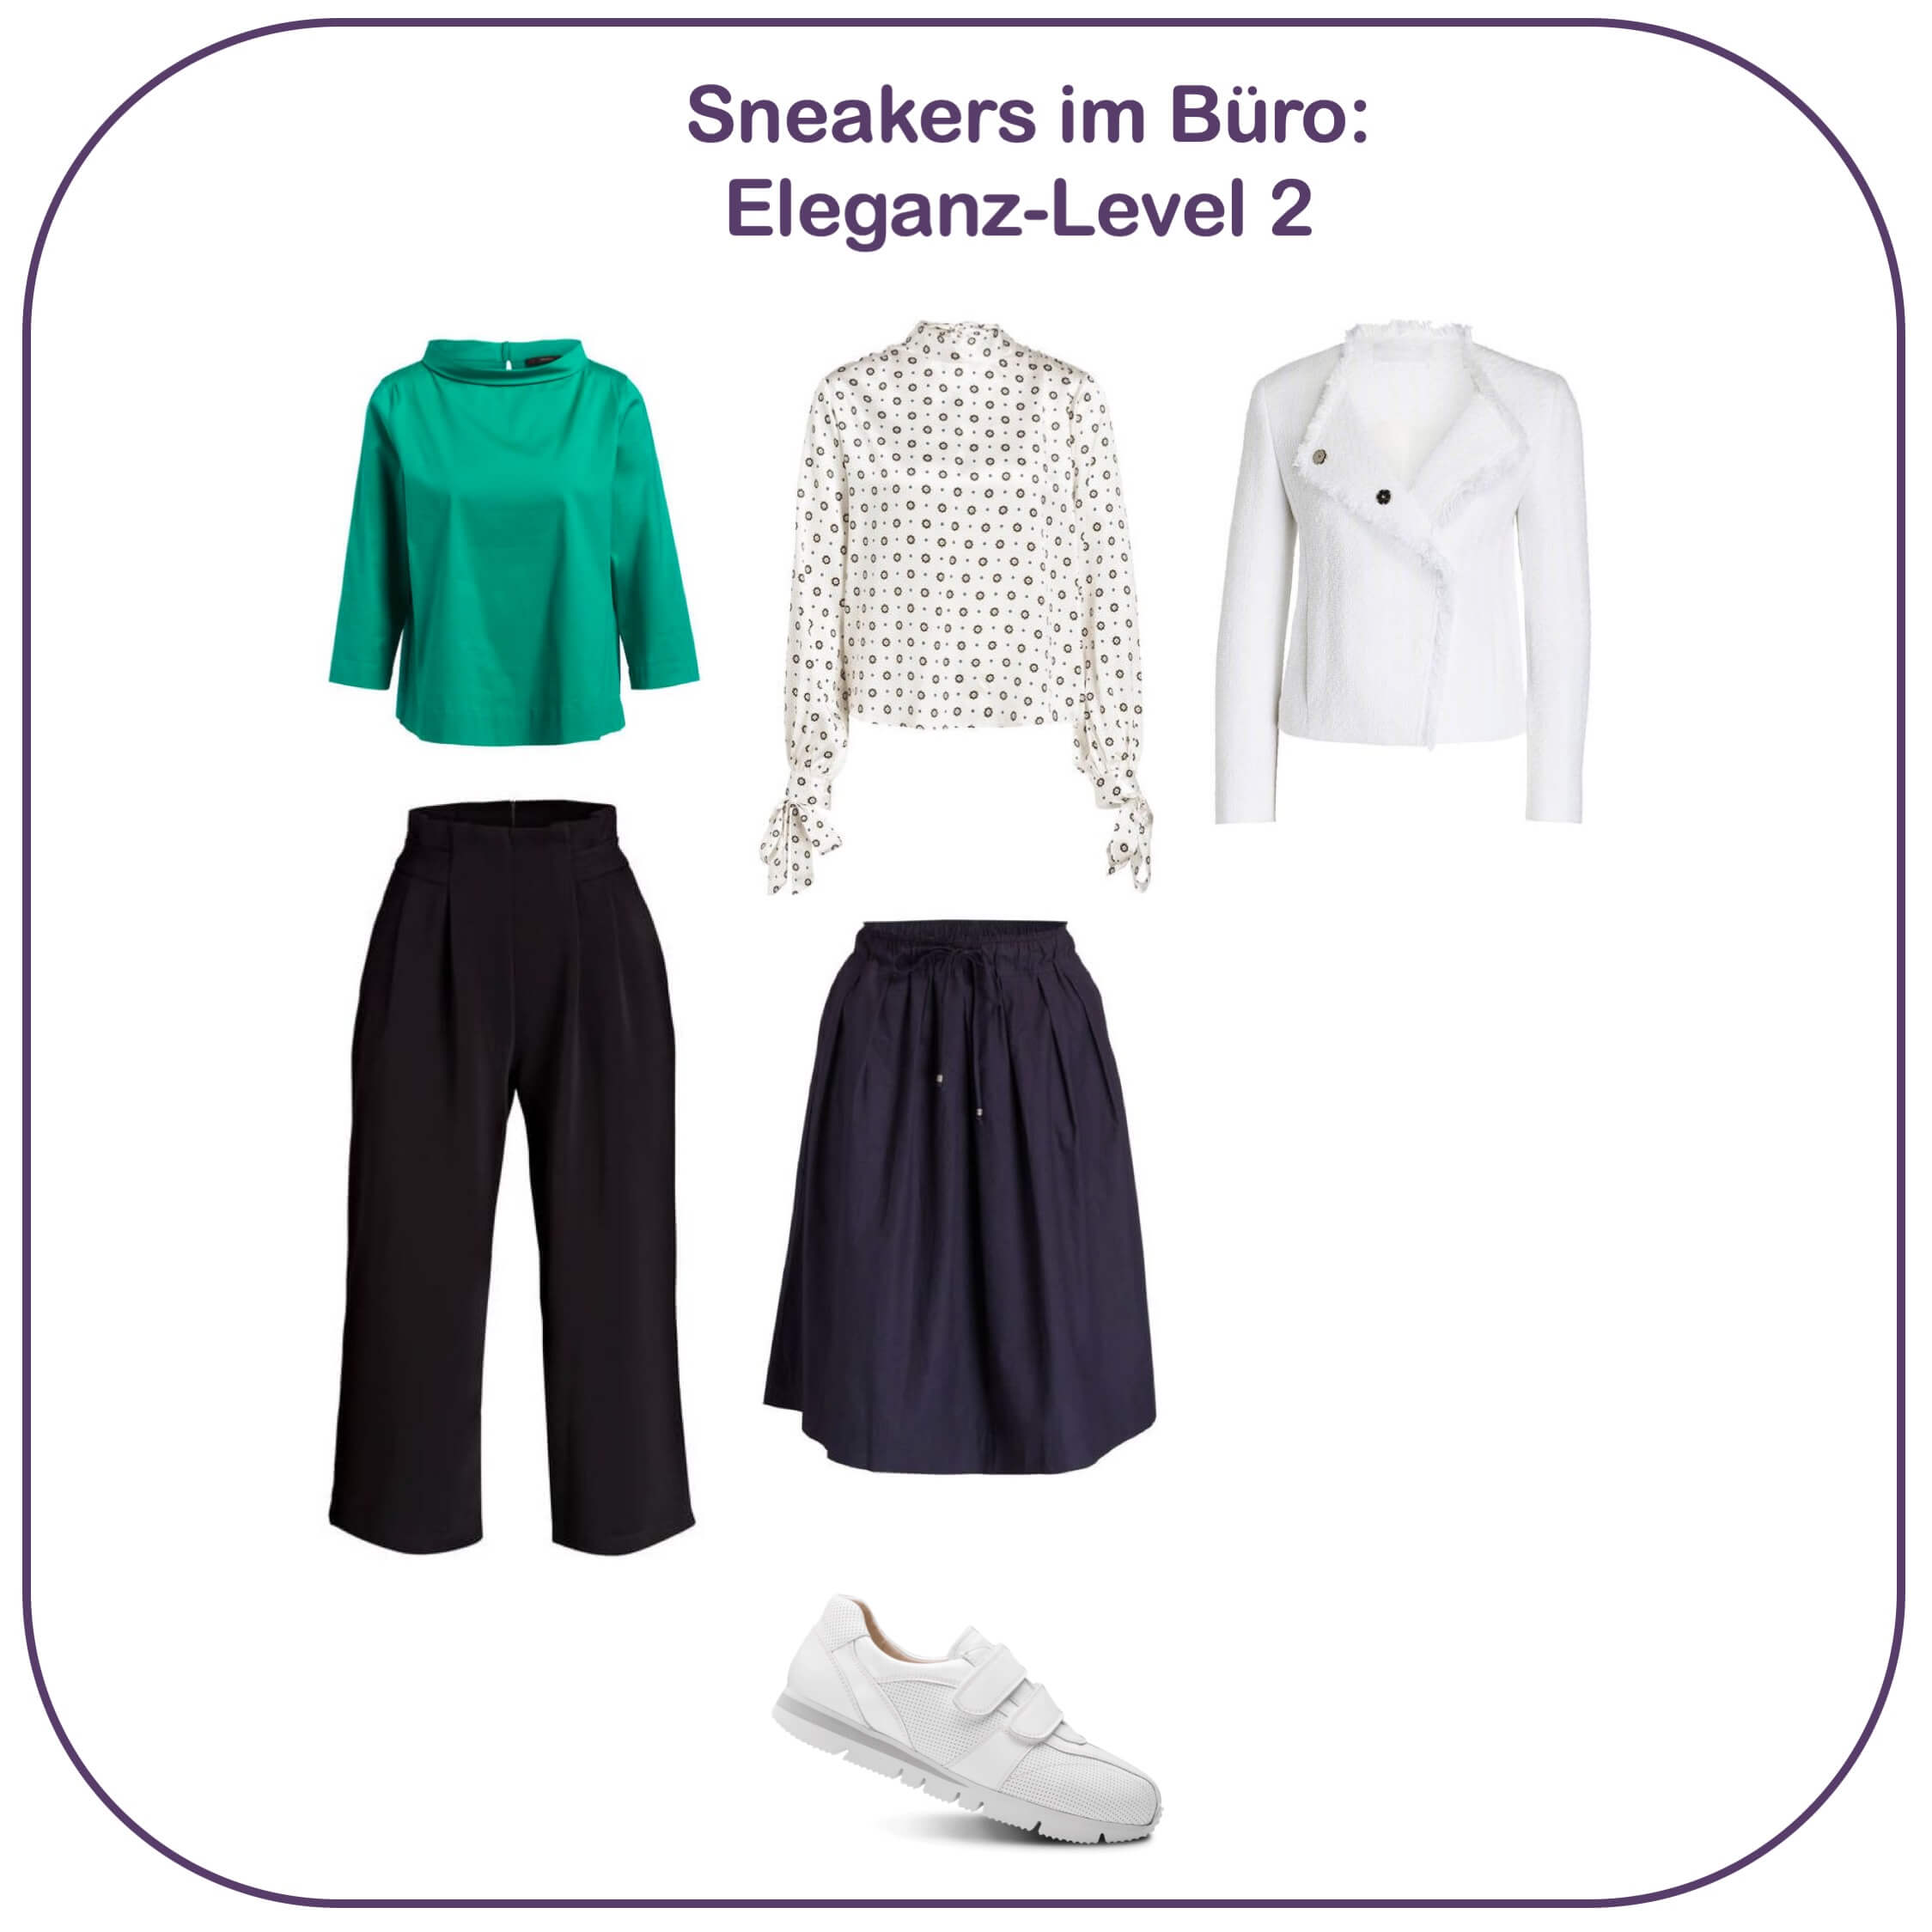 Sneakers im Büro - Eleganz-Level 2